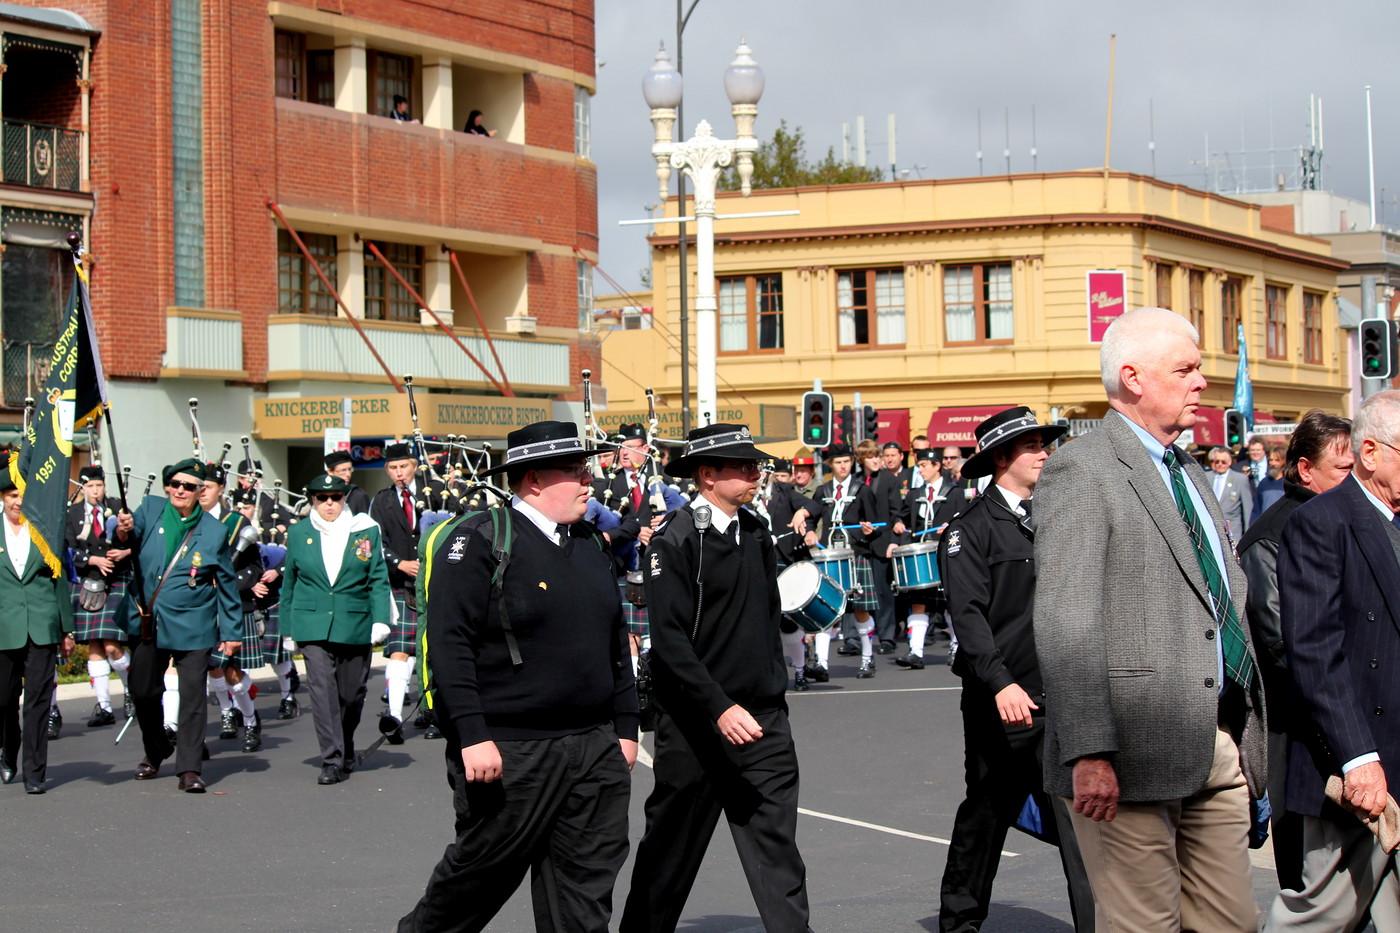 ANZAC Day parade Bathurst 250412 008.jpg